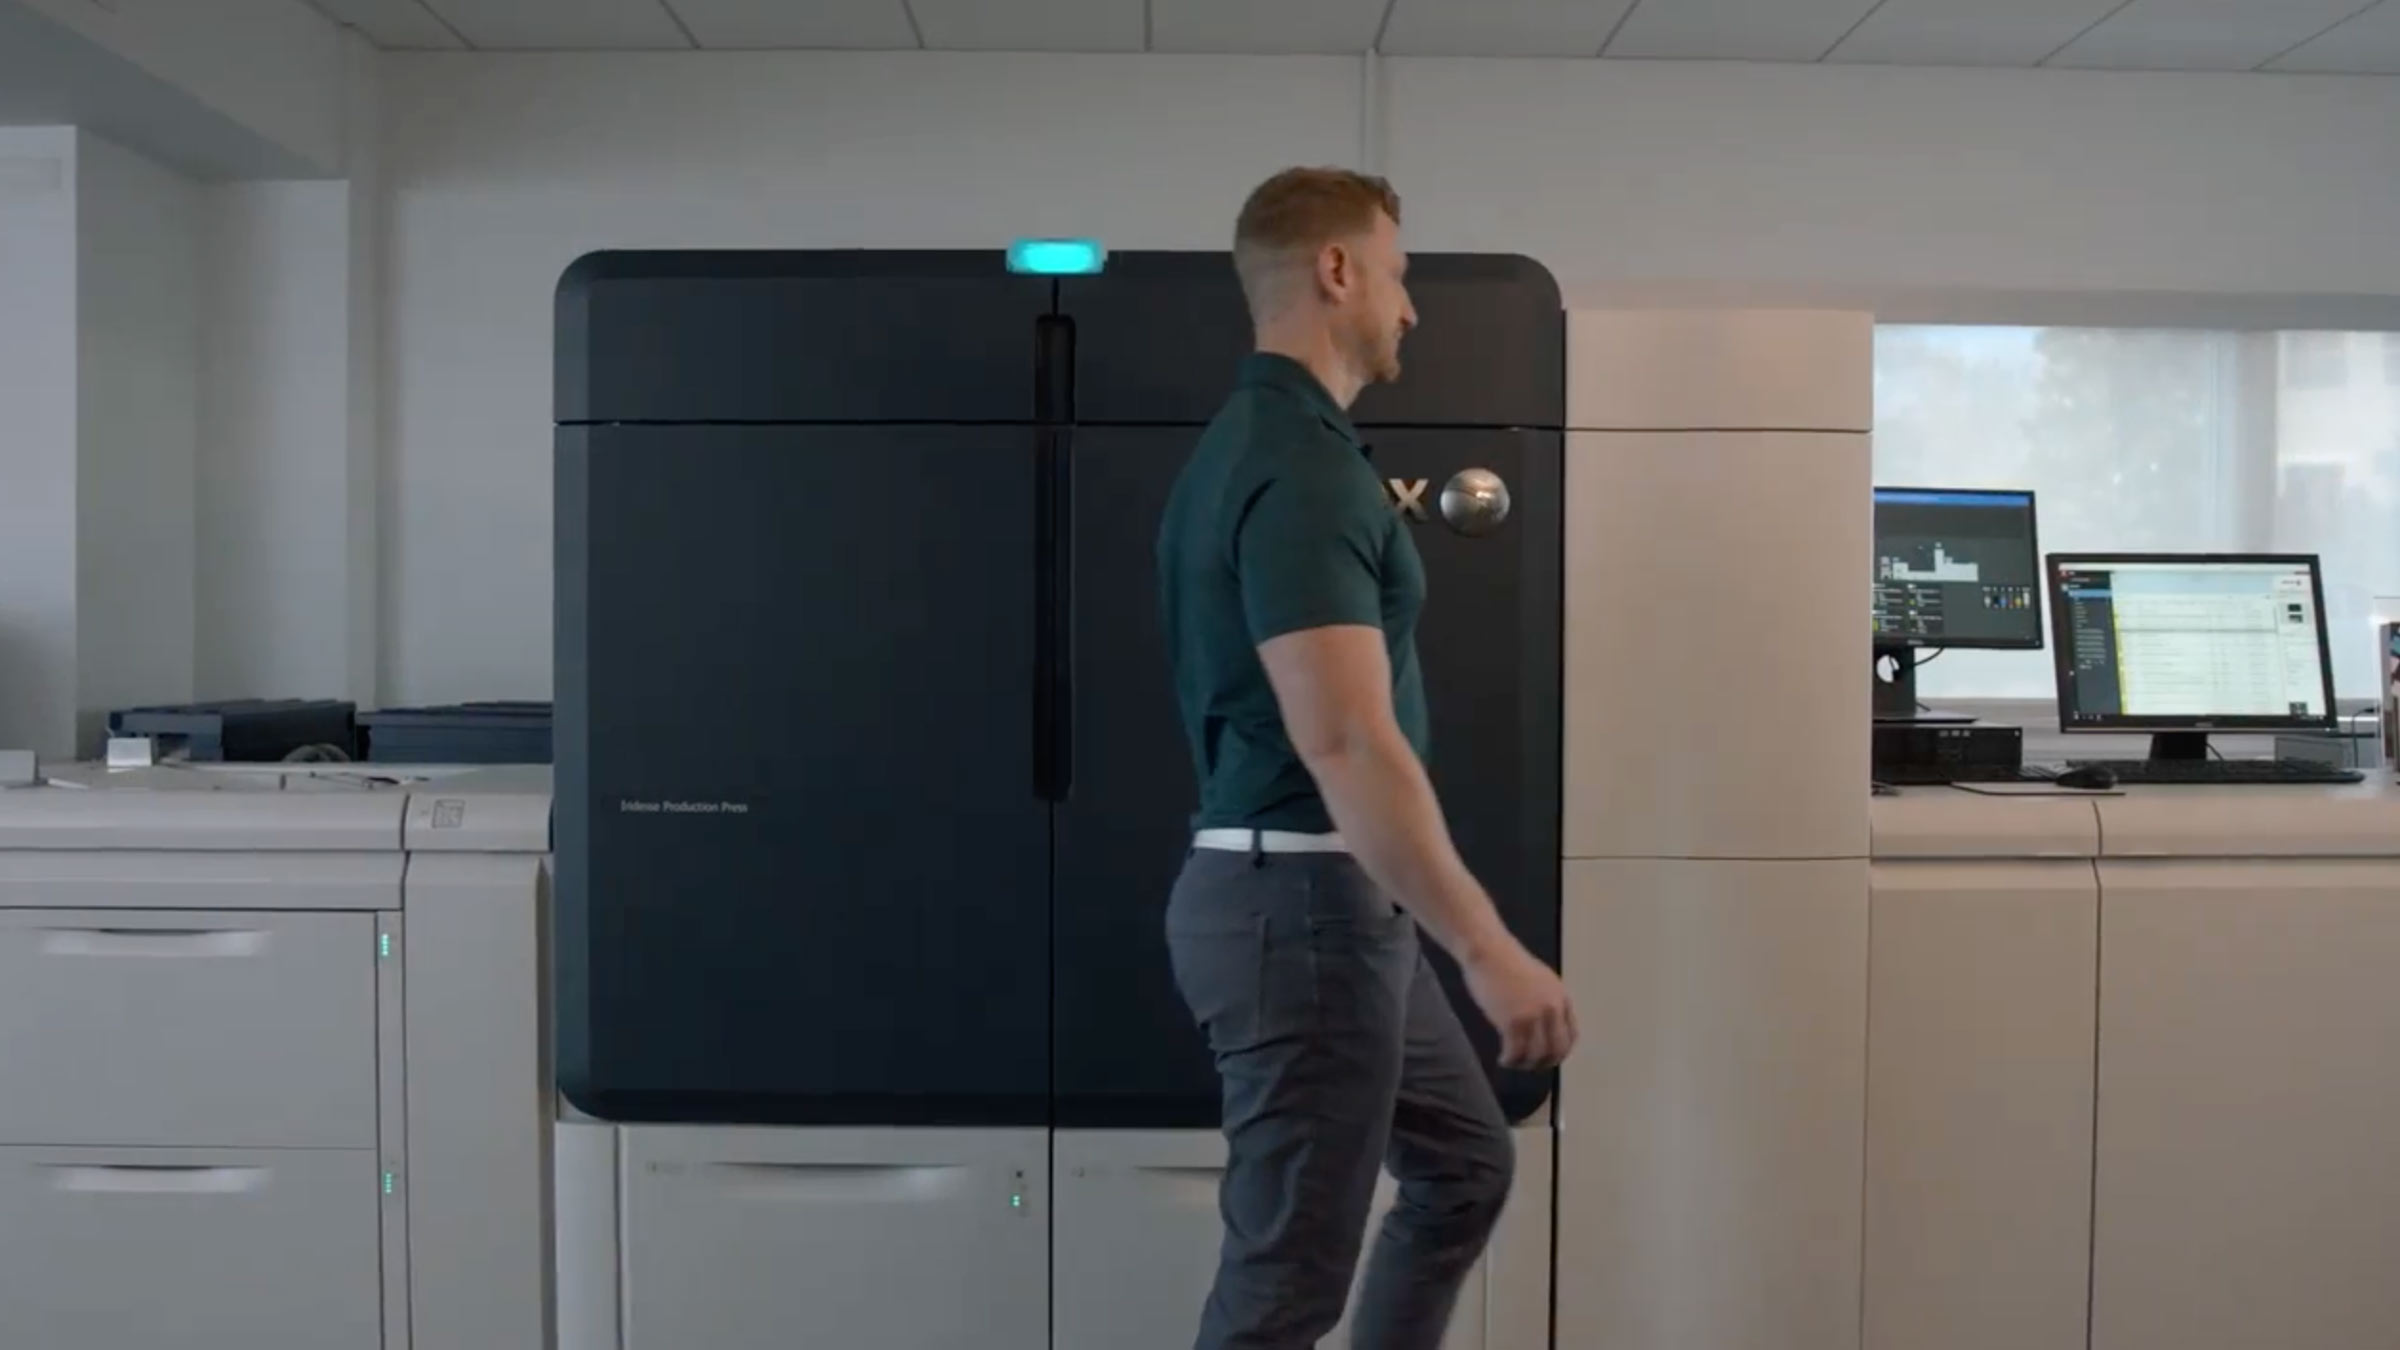 Man walking by printers